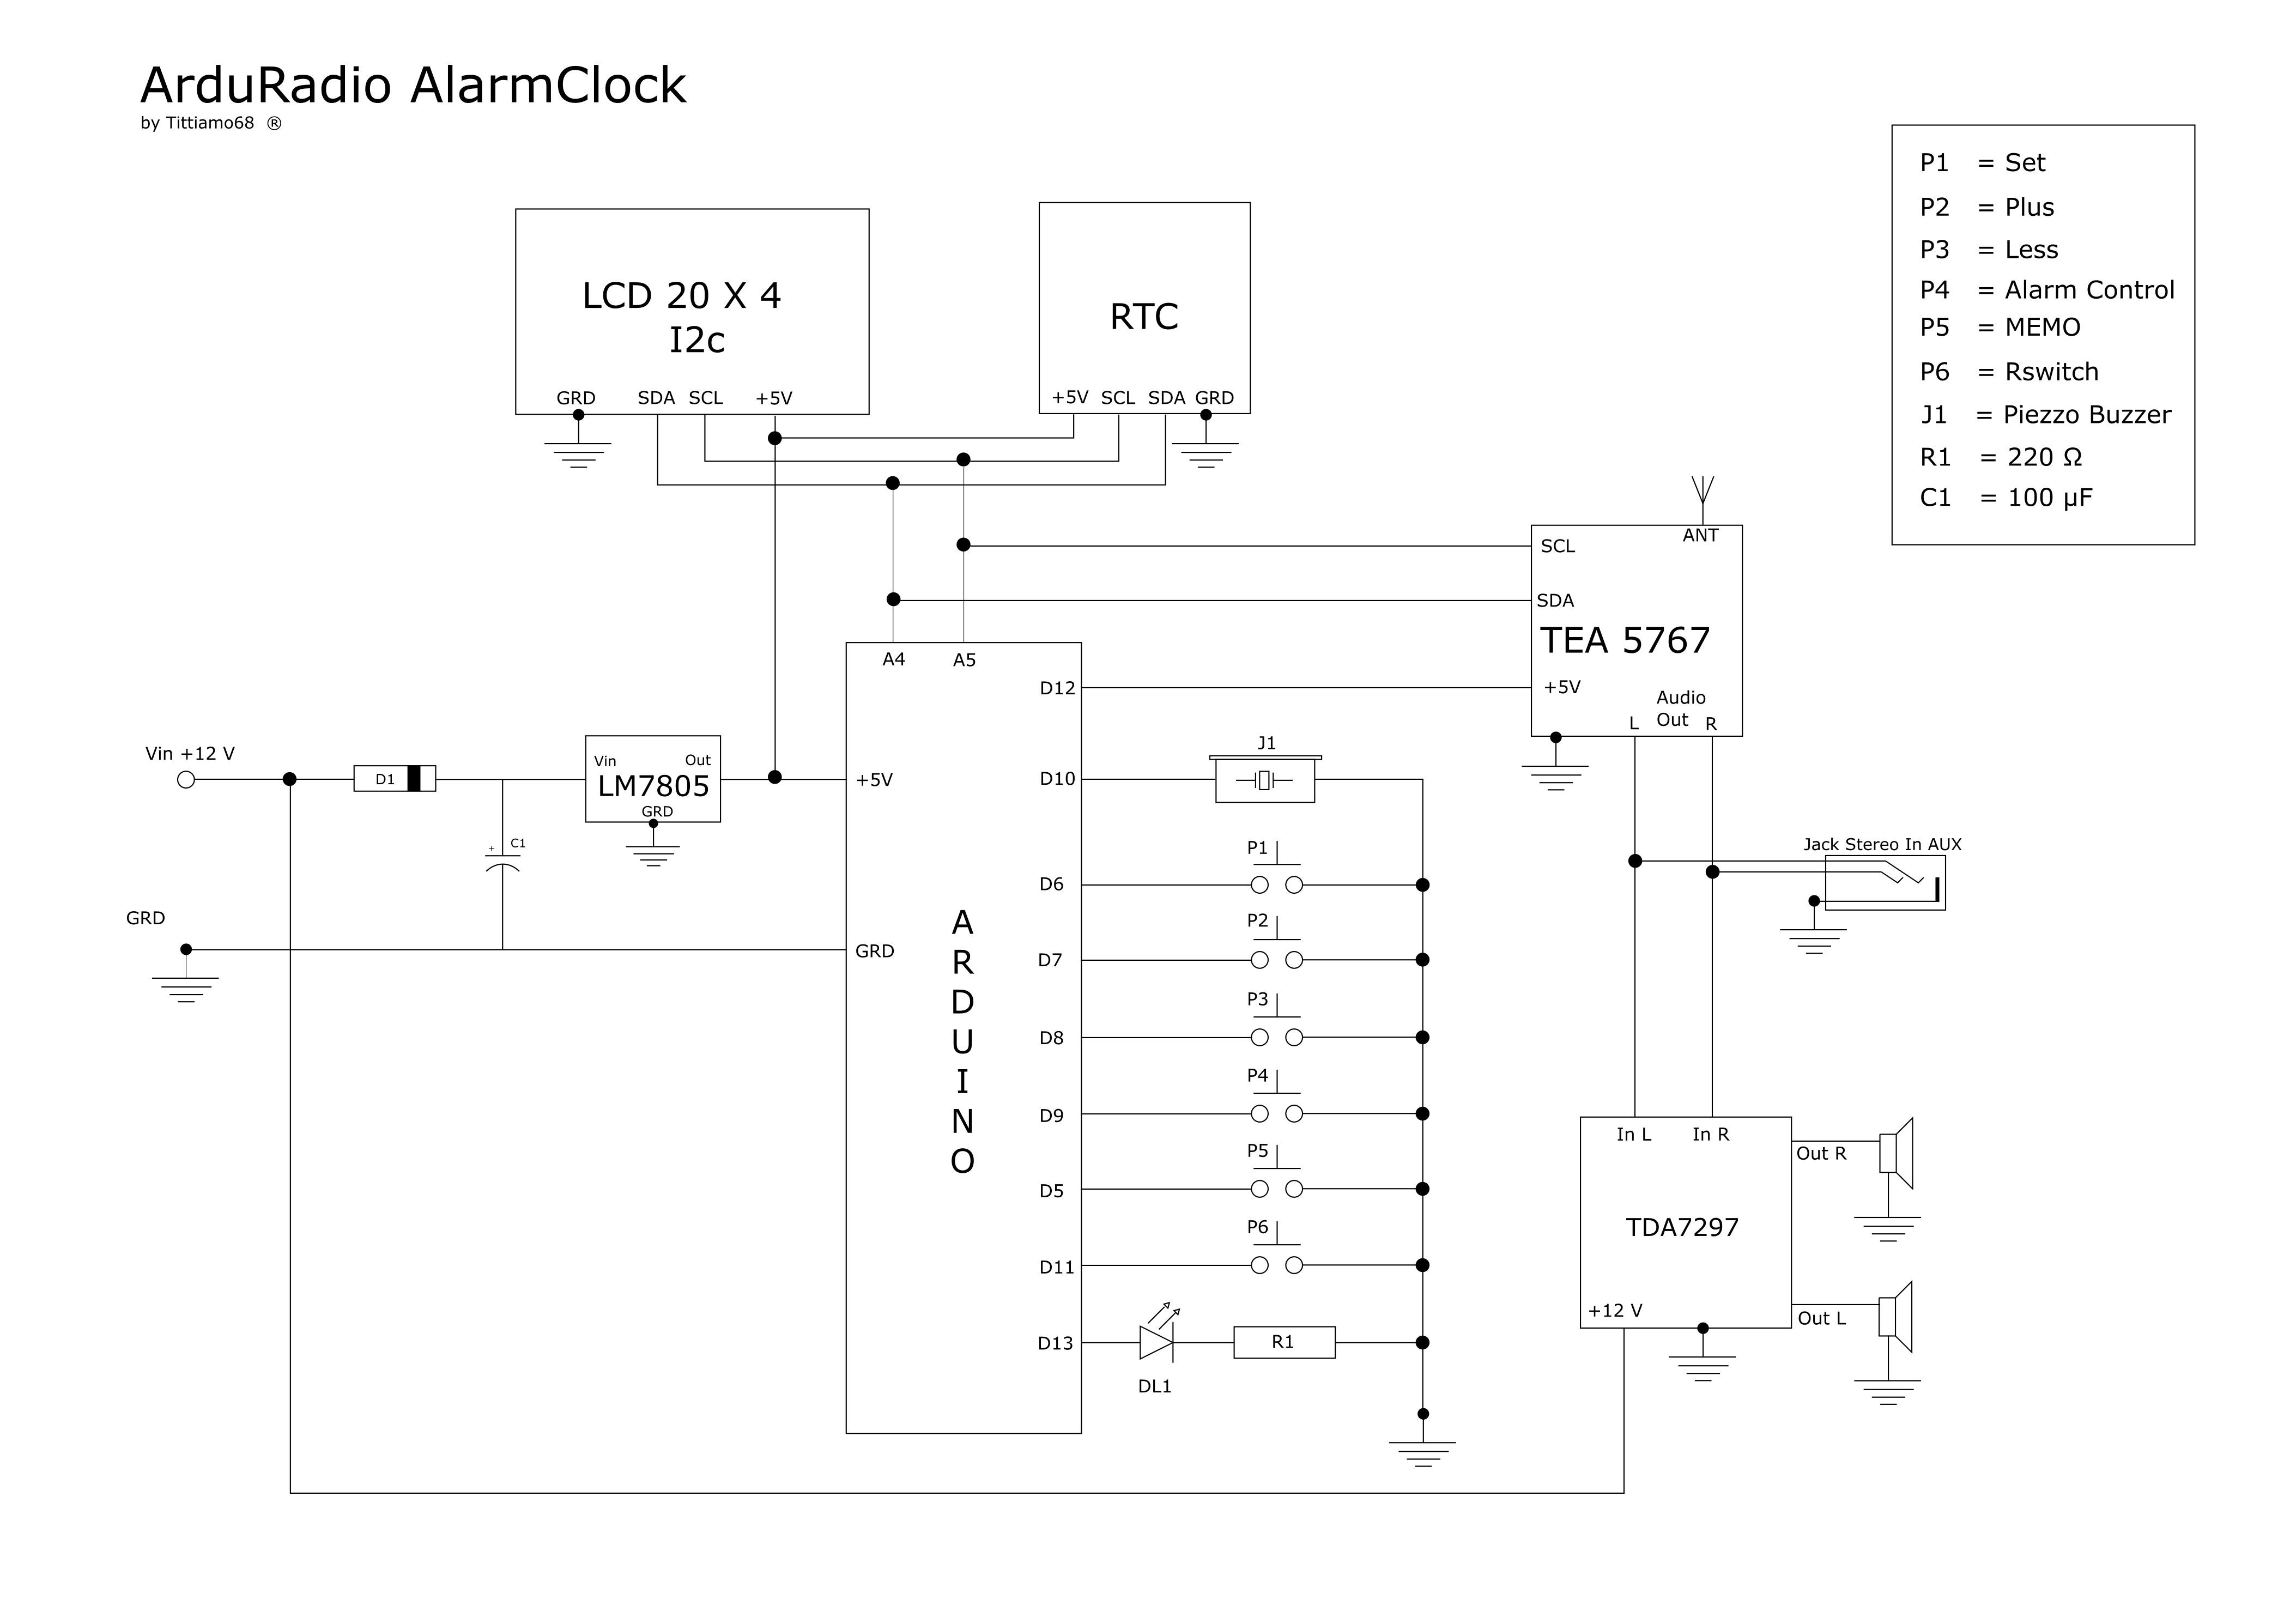 Arduradio Alarmclock 7805 Schema Byc99dfl7a